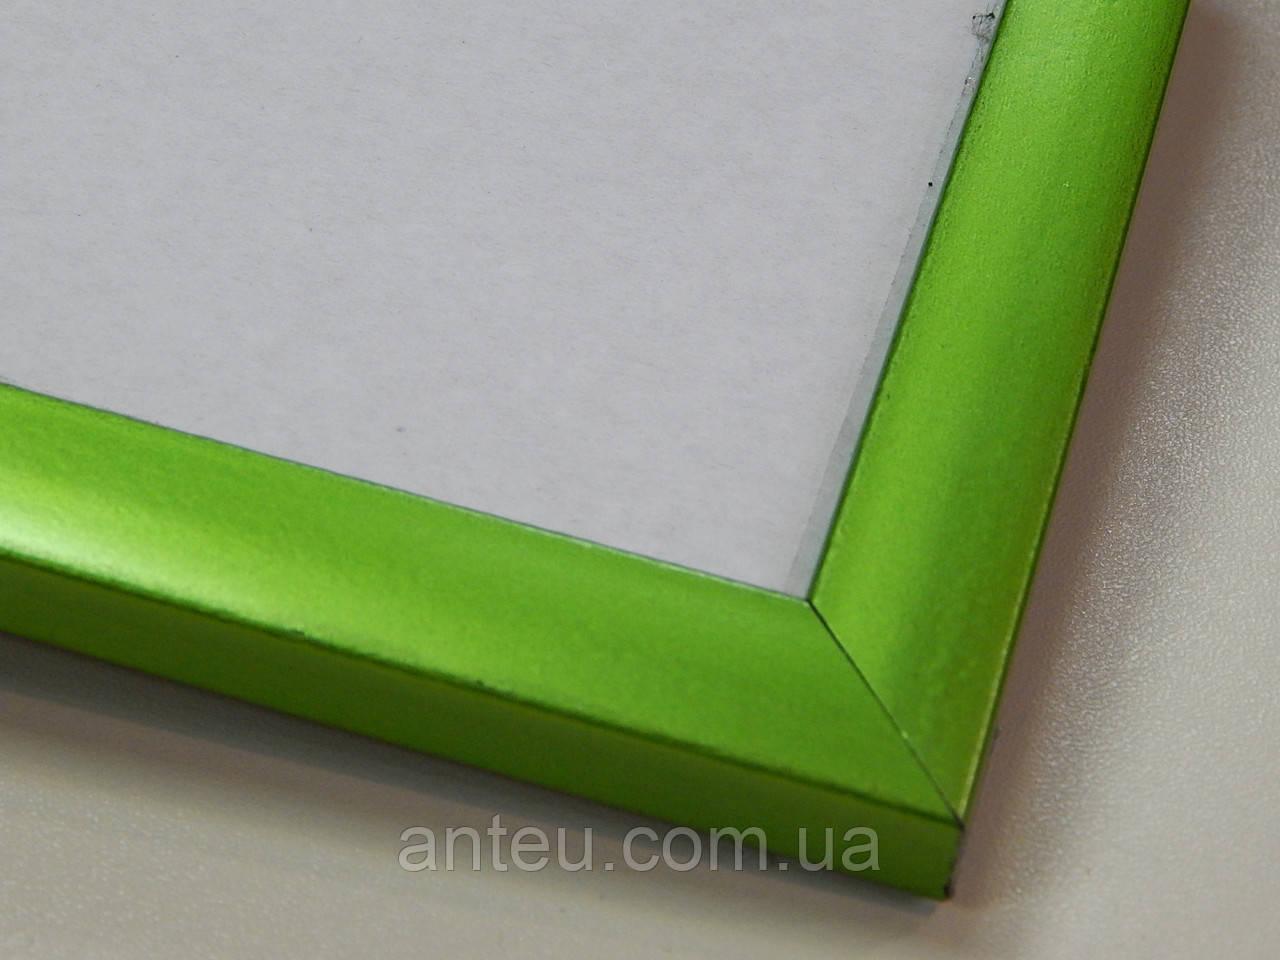 Рамка А3 (297х420).Профиль квадрат 16 мм.Зеленый металик.